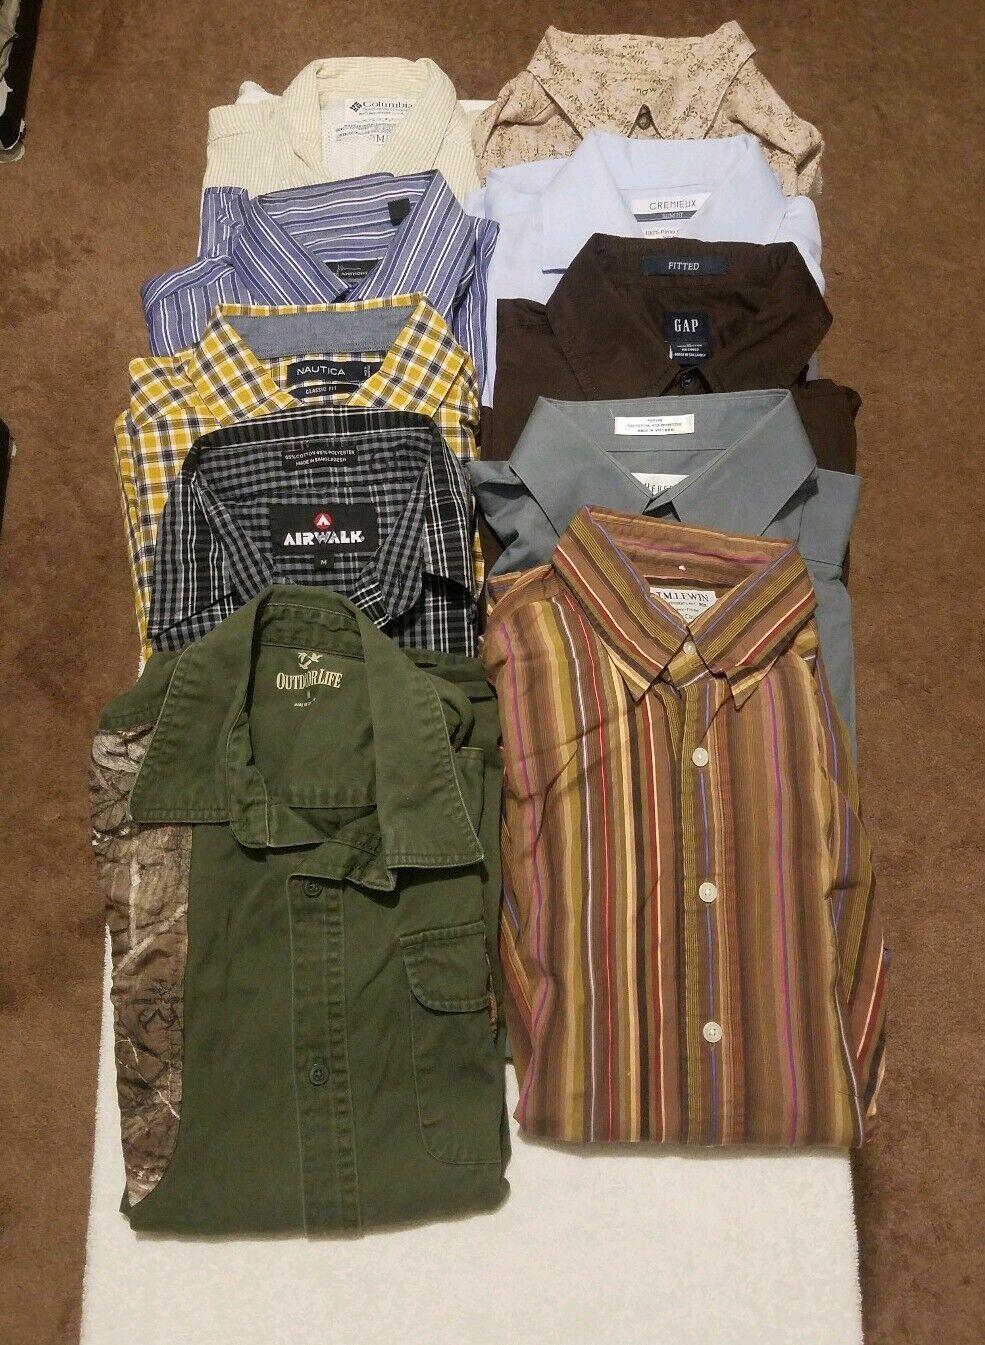 Lot of 10 Shirts Size Medium Mixed MARC ANTHONY COLUMBIA NAUTICA L\S